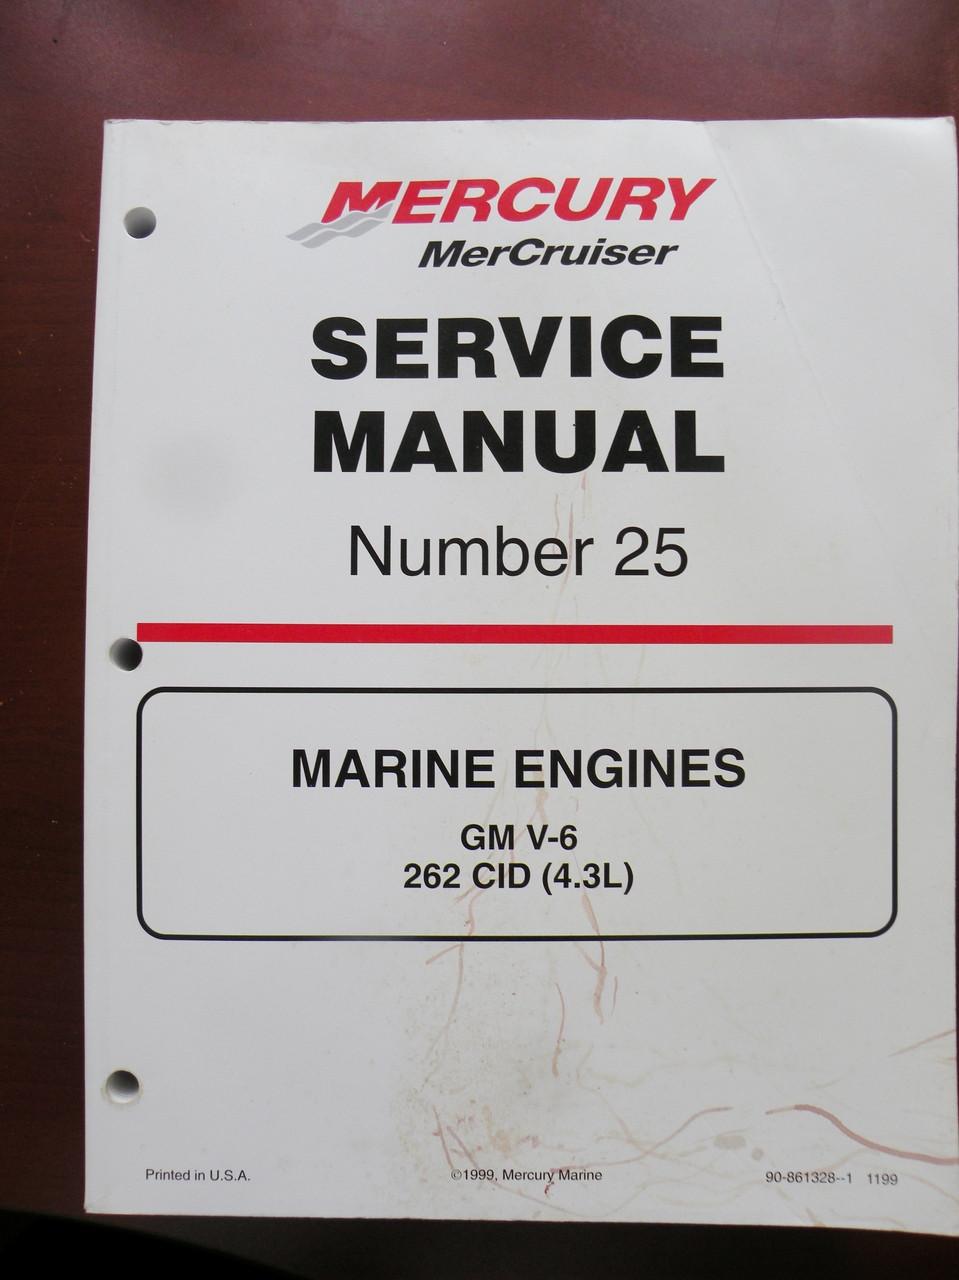 mercruiser service manual 1 owners manual book u2022 rh userguidesearch today mercruiser service manual 1990 Mercruiser Fuel Pump